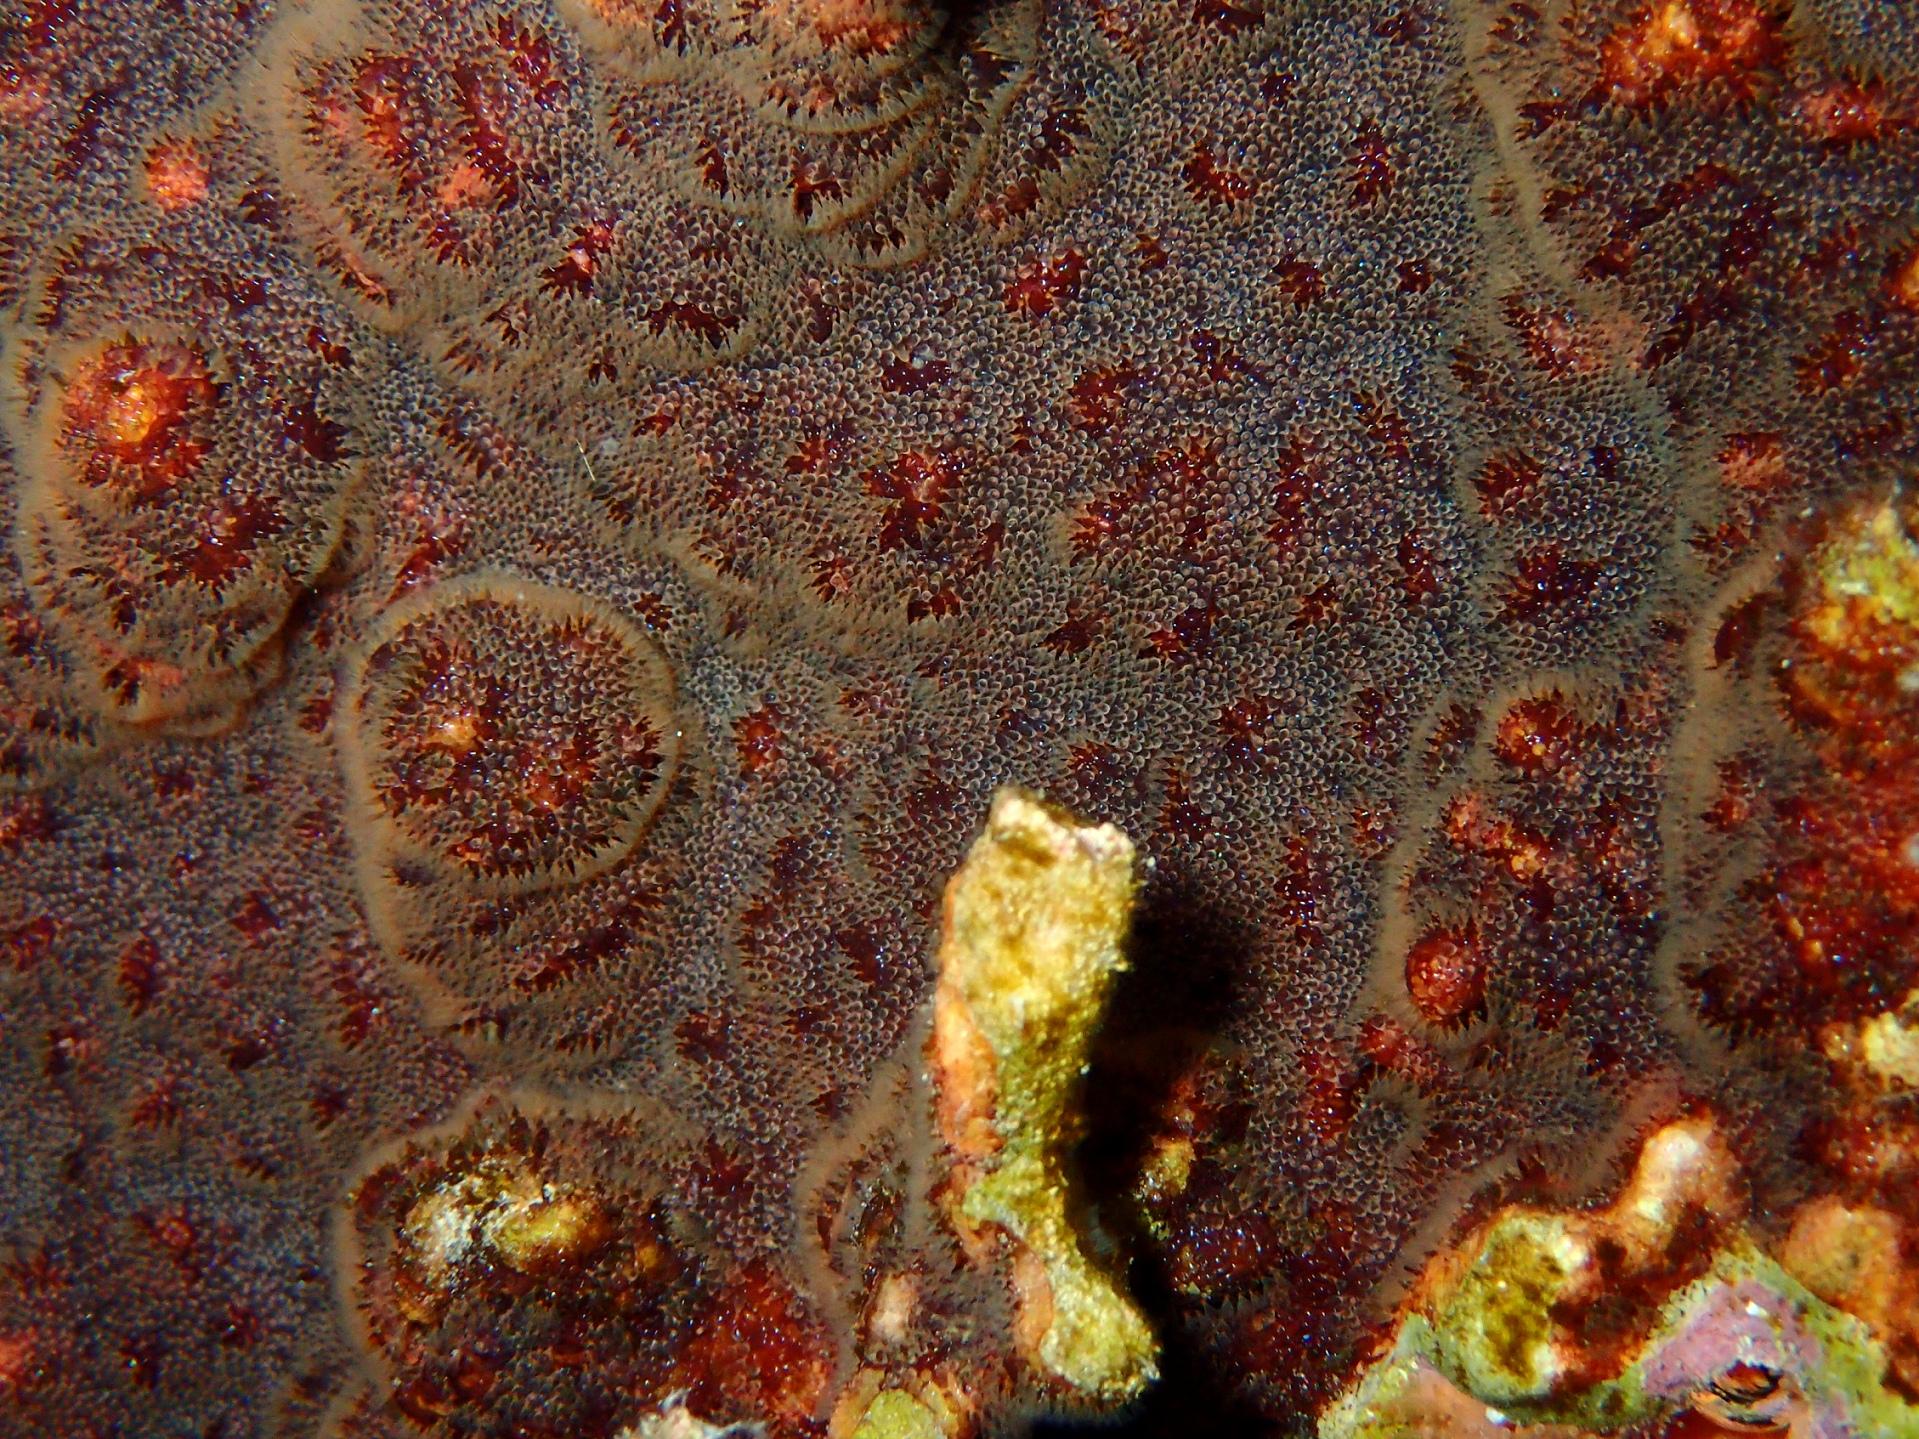 Schizoporella-brun